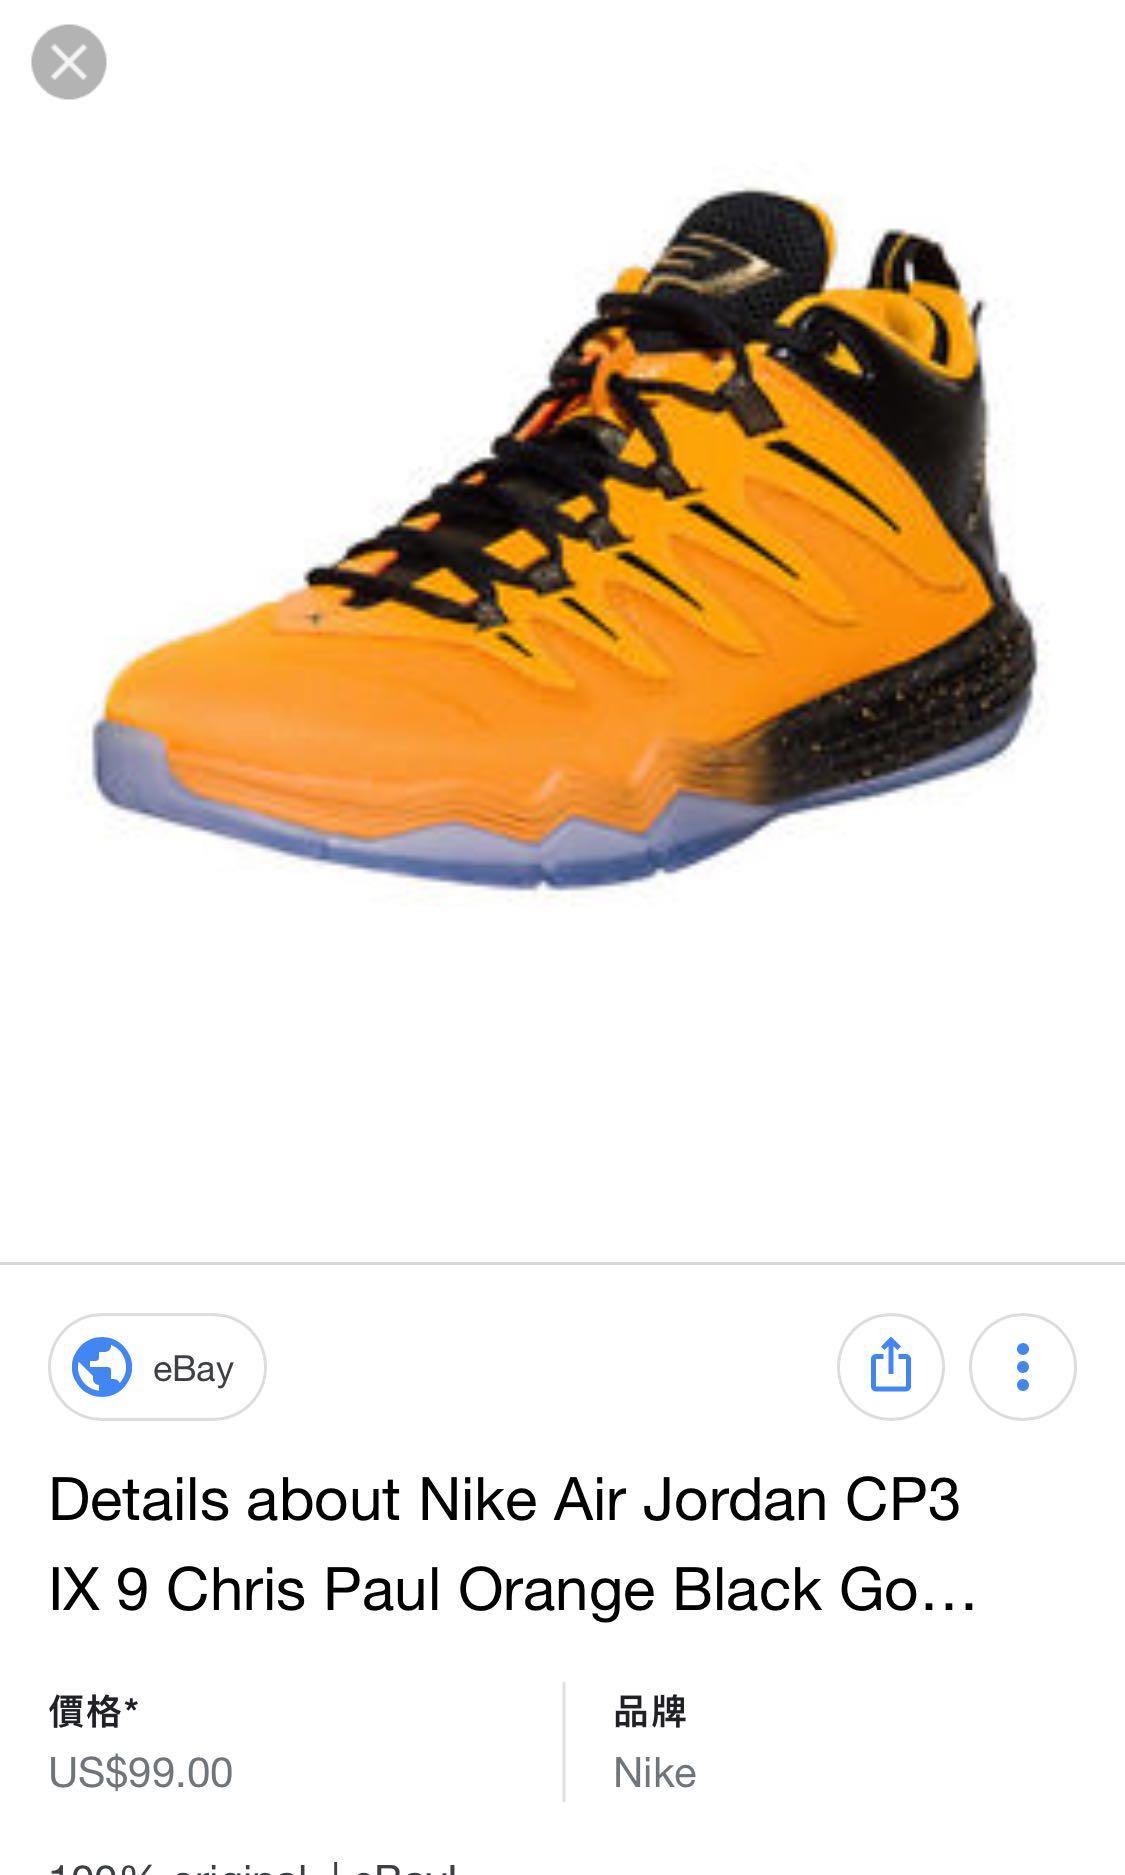 36e0948ab2fe Nike Air Jordan CP3 IX 9 Chris Paul Orange Black Gold 810868-012 Size 11  45碼on Carousell